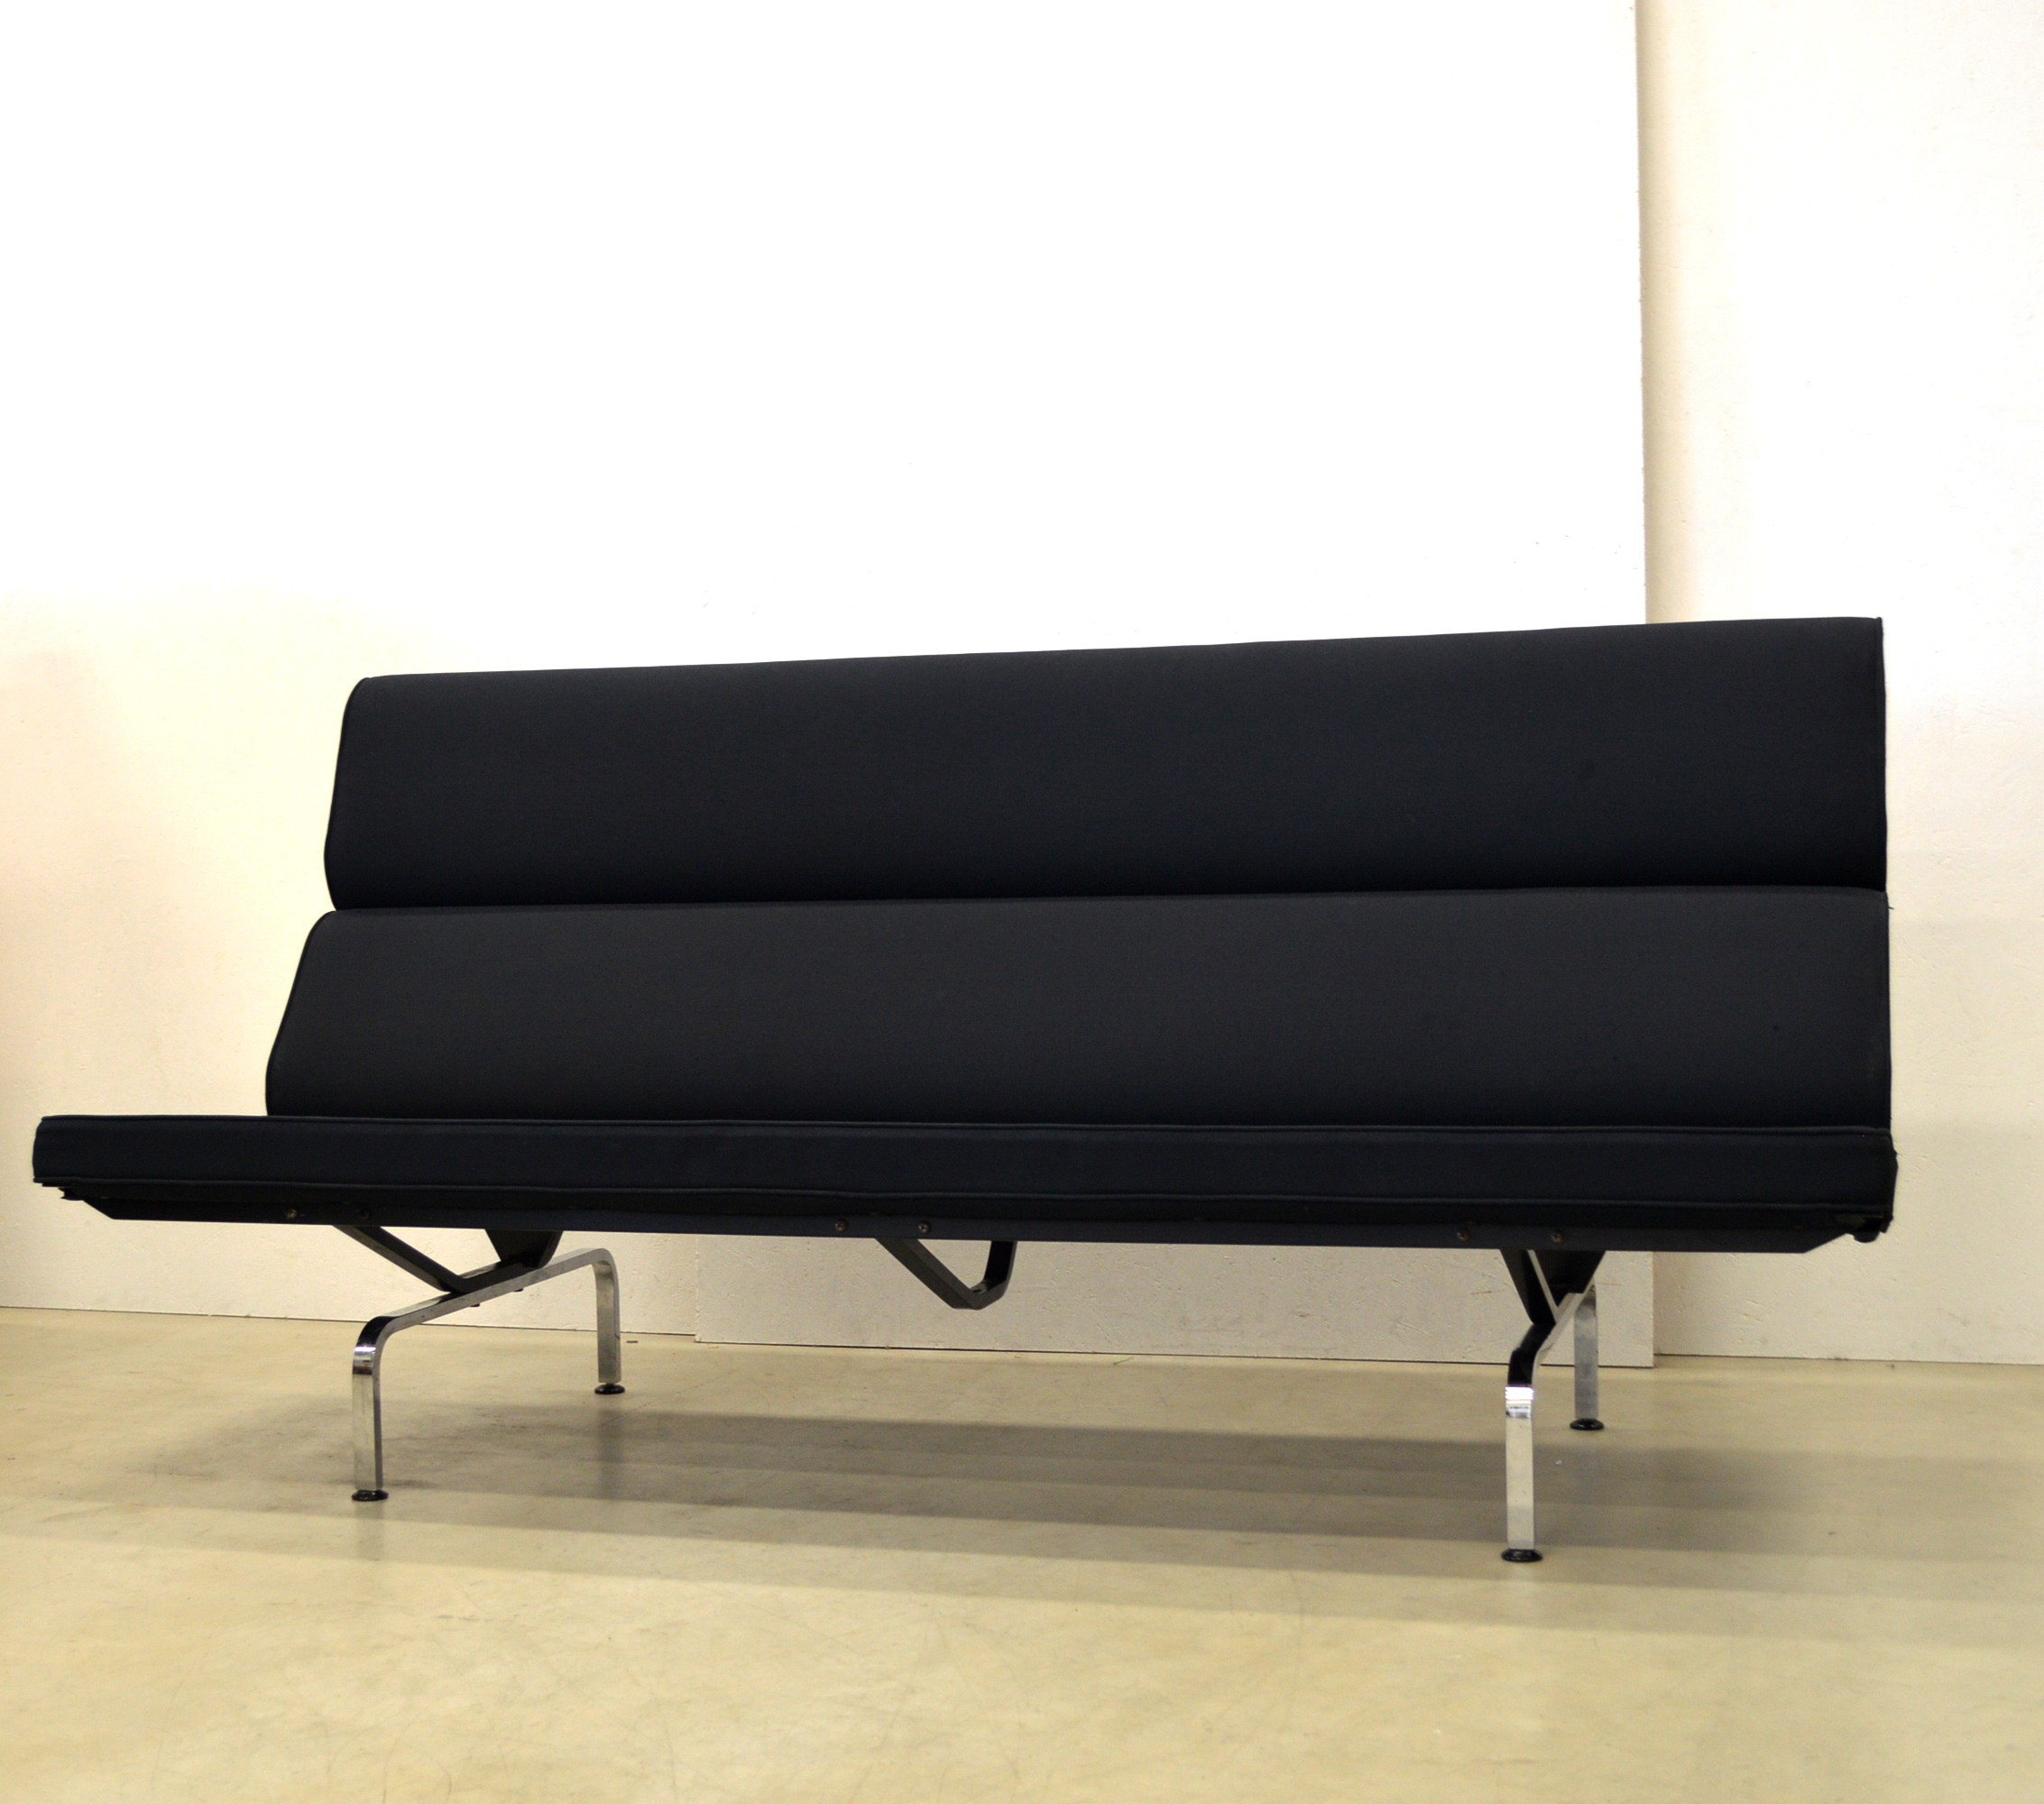 charles eames compact sofa hereo sofa. Black Bedroom Furniture Sets. Home Design Ideas